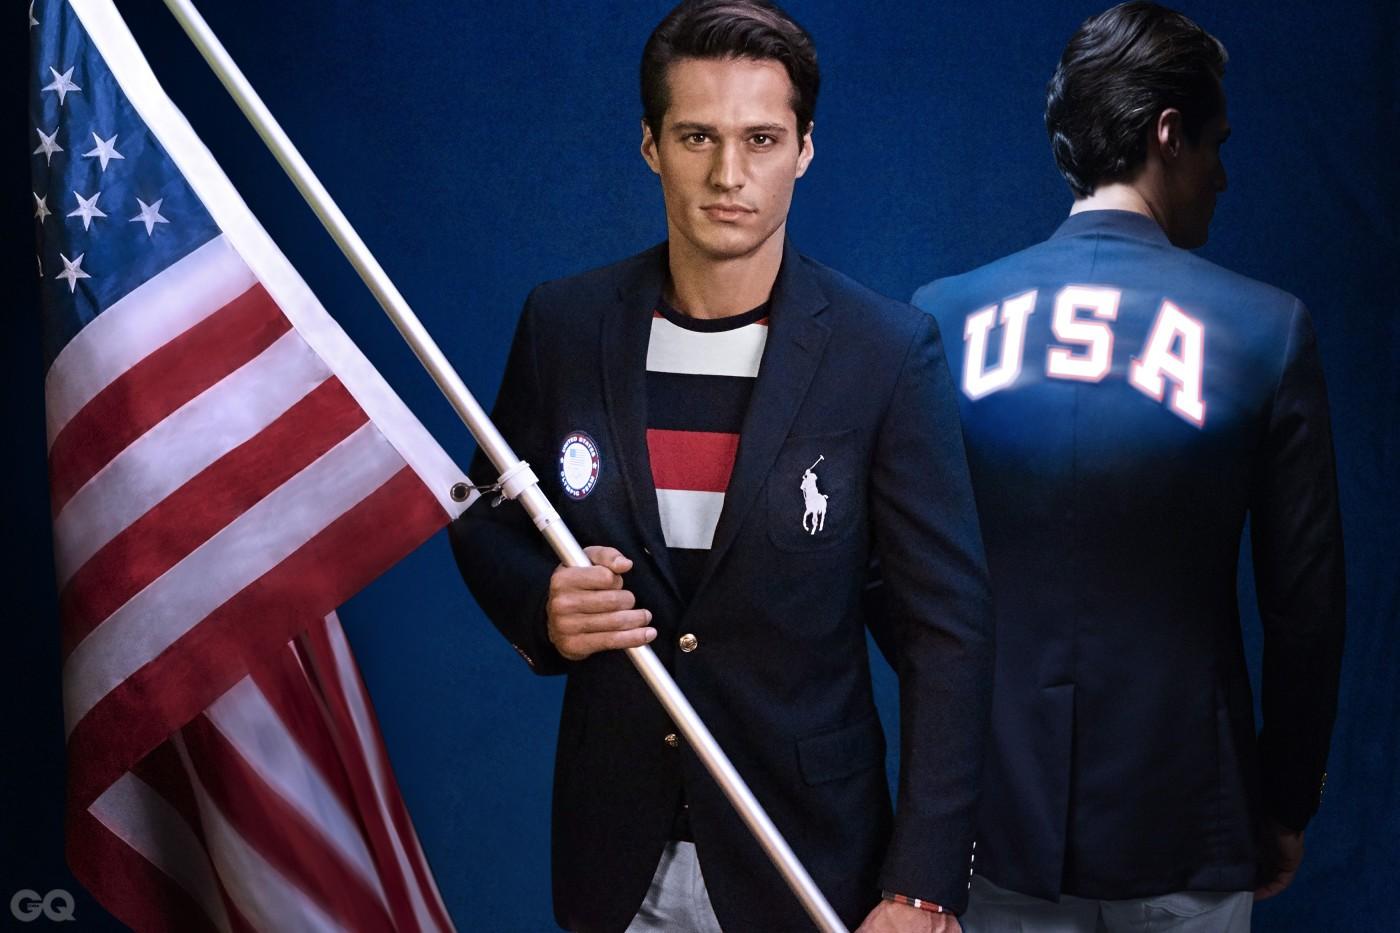 Flag Bearer Jacket